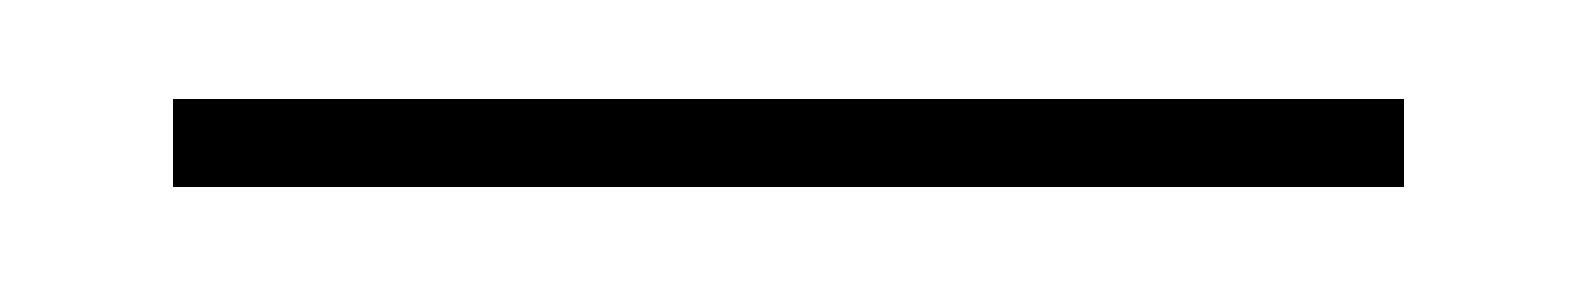 FOW-logo.png